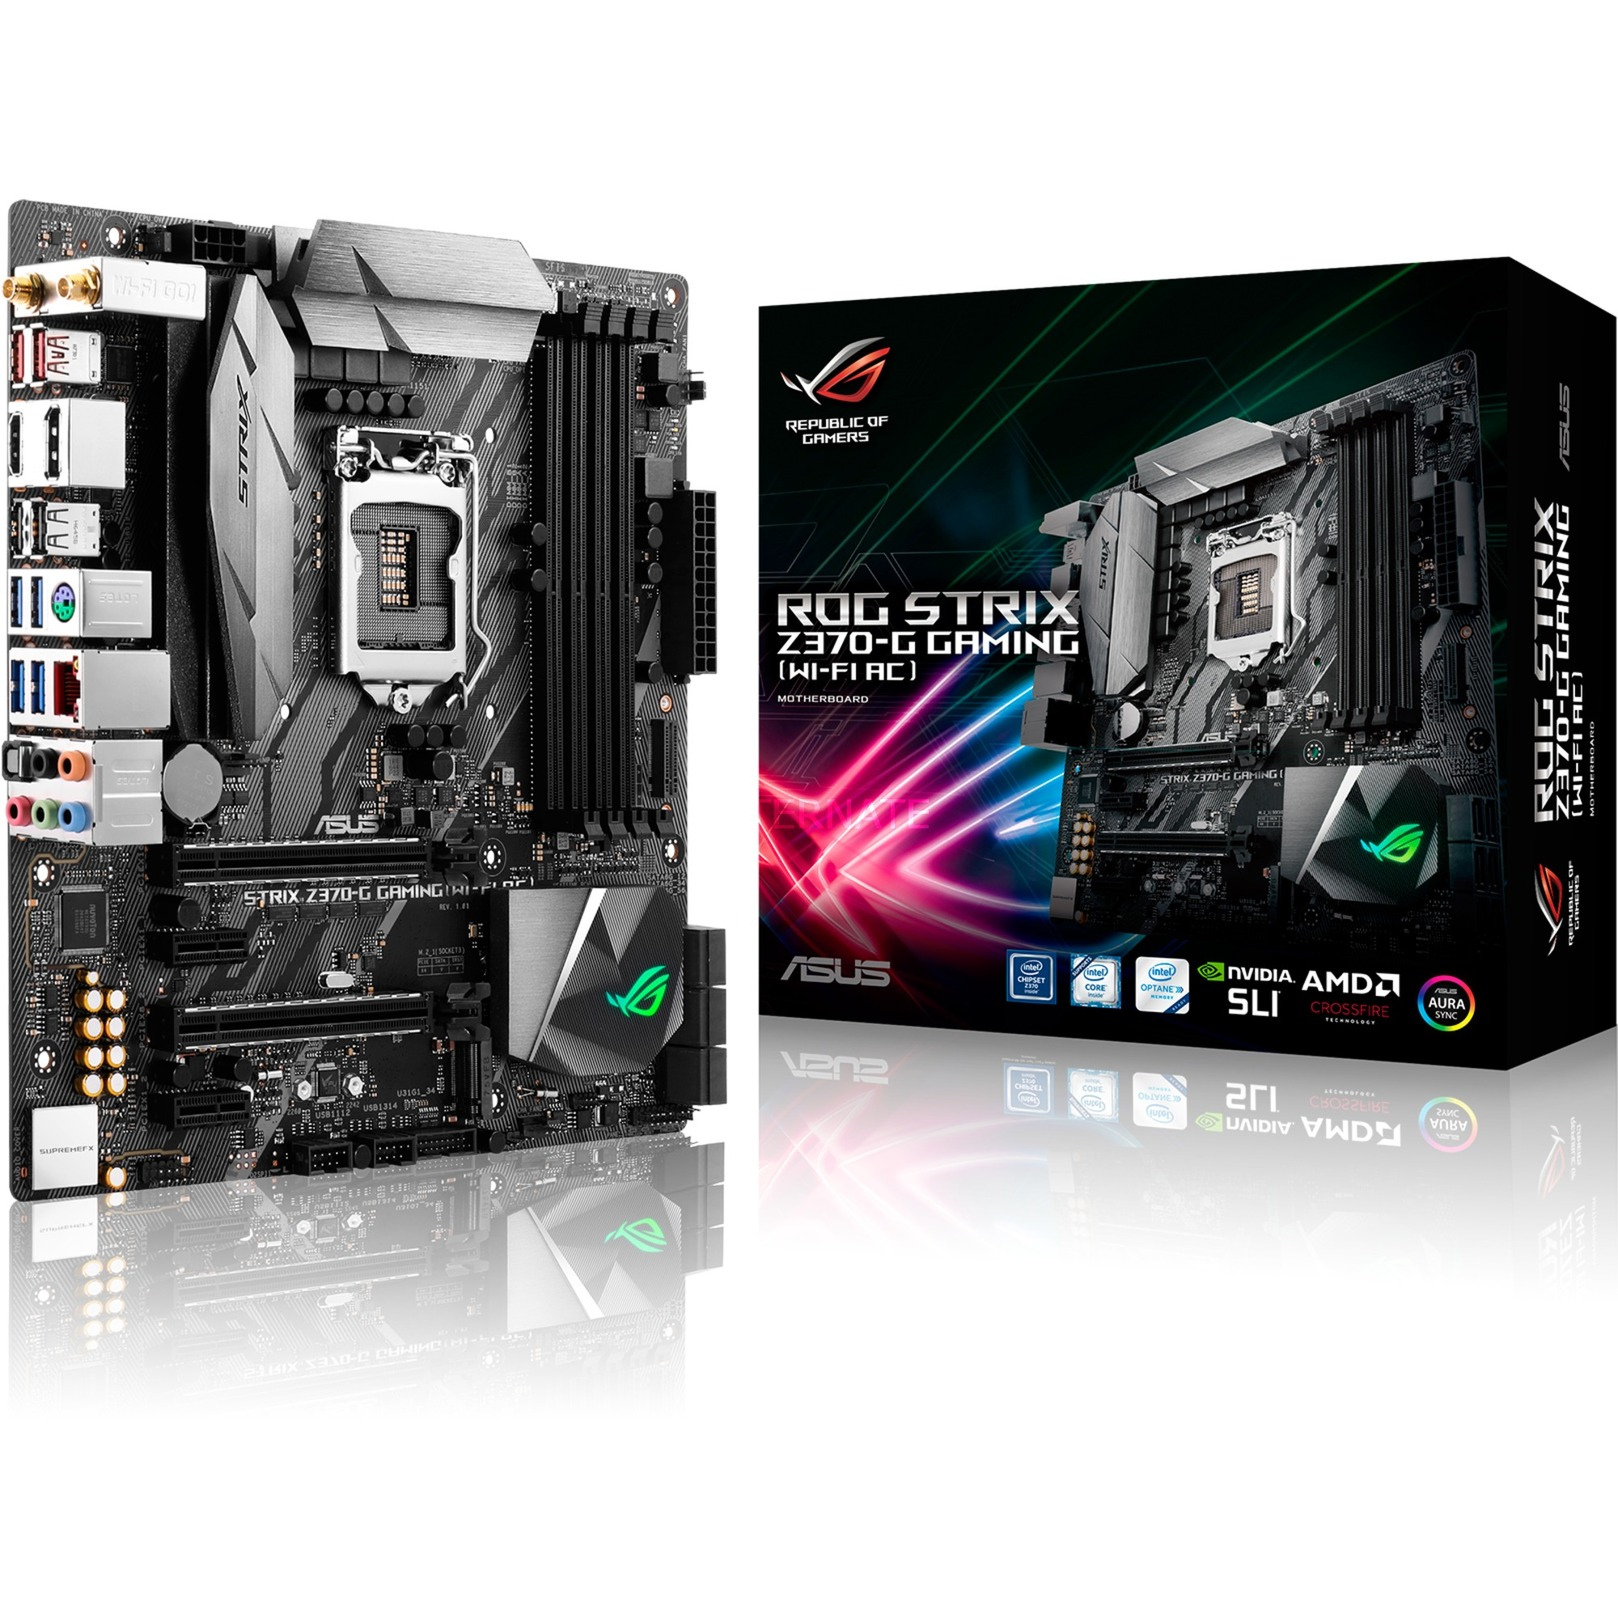 ROG STRIX Z370-G GAMING (WI-FI AC) LGA 1151 (Socket H4) microATX carte mère